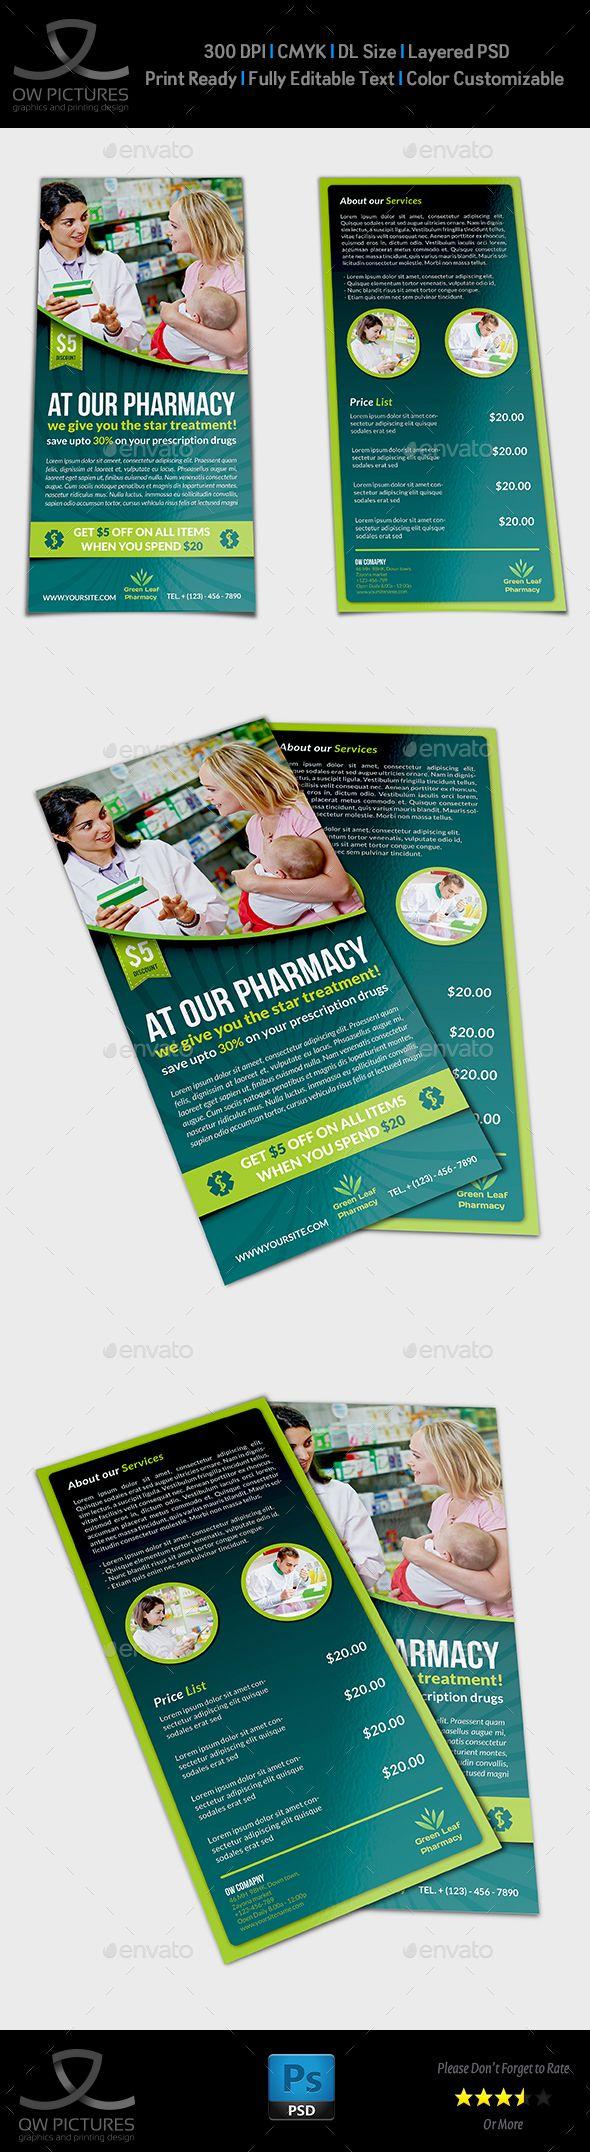 Zumba flyer design zumba flyers - Pharmacy Flyer Dl Size Template